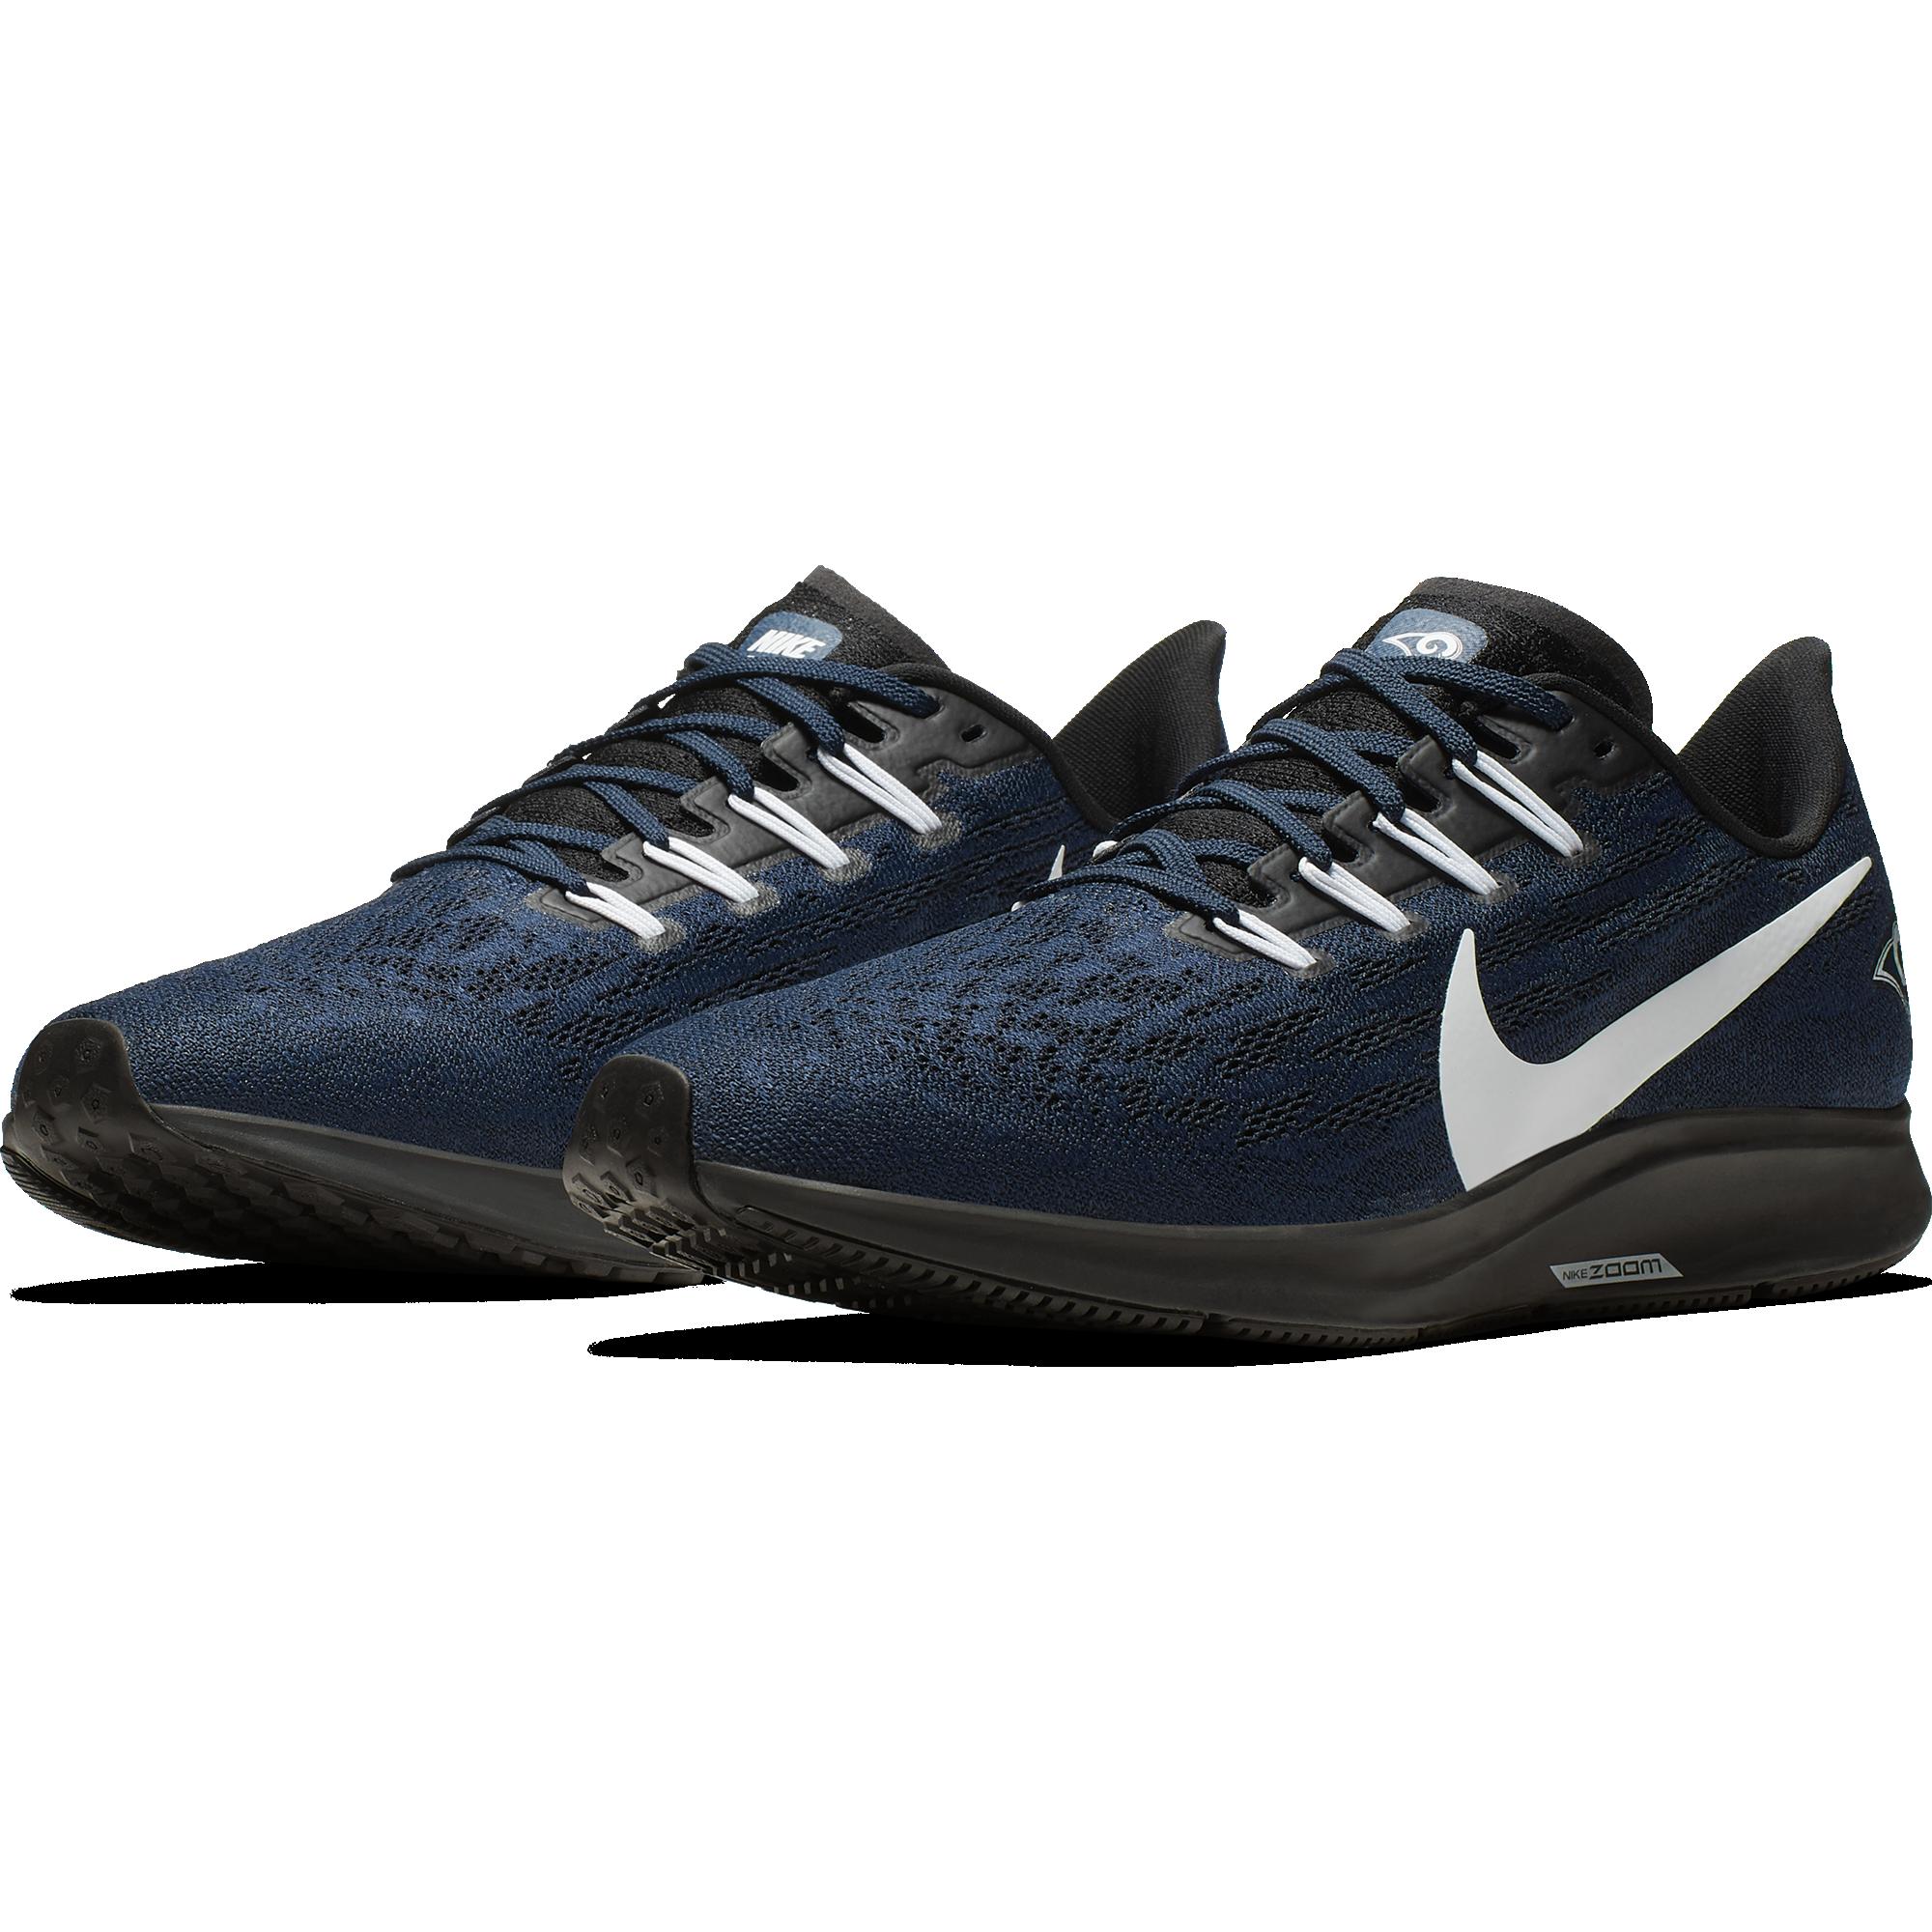 15fa0b8d Nike drops the new Air Zoom Pegasus 36 Rams shoe! - Turf Show Times